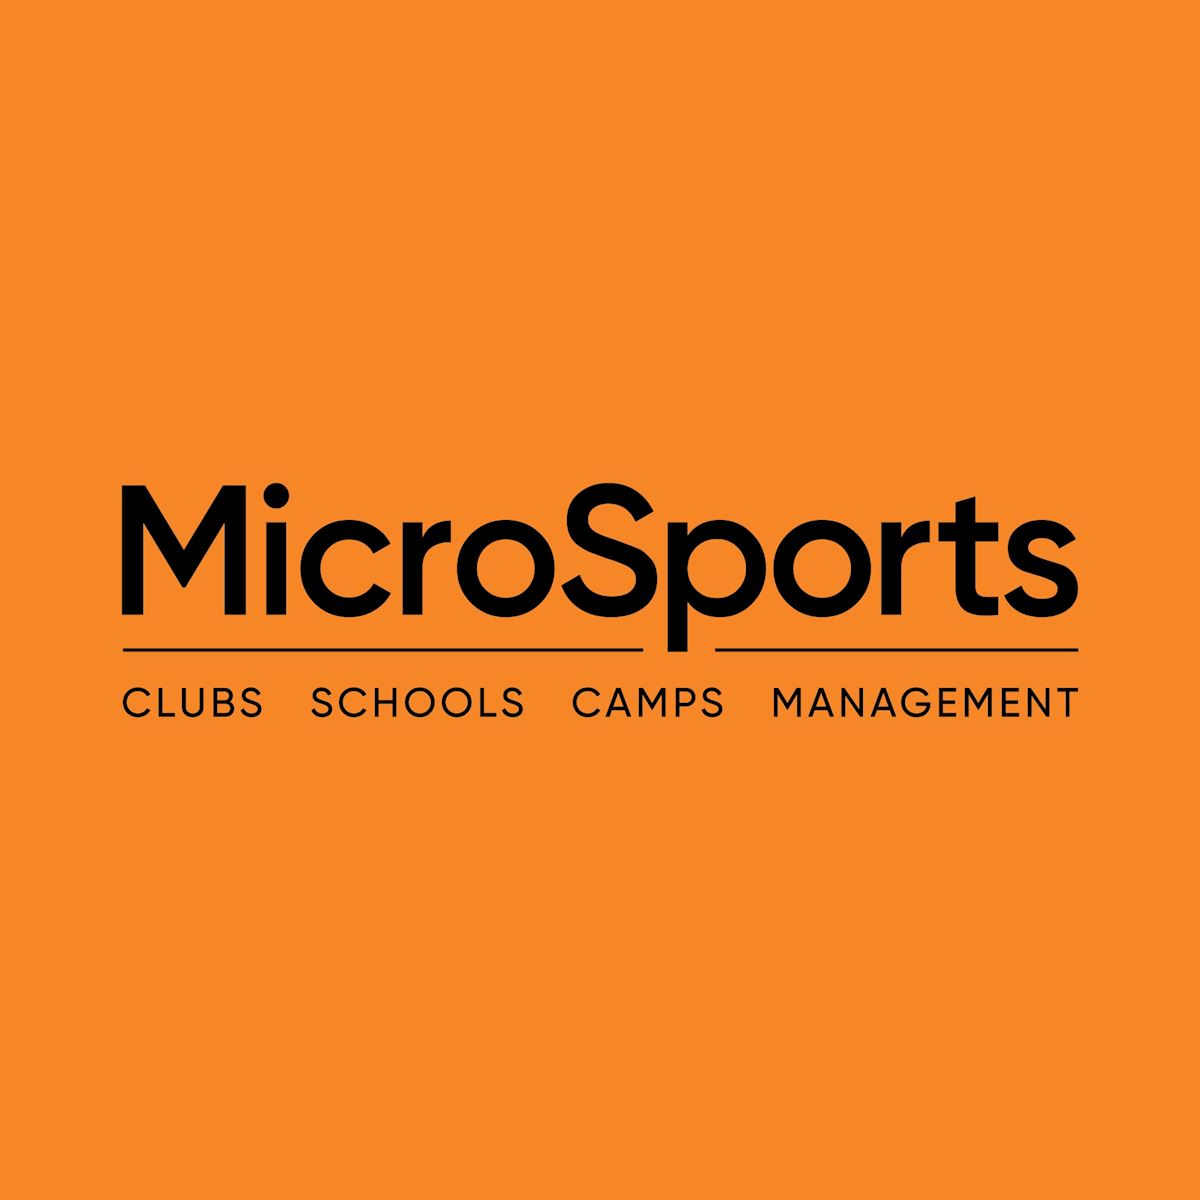 Microsports